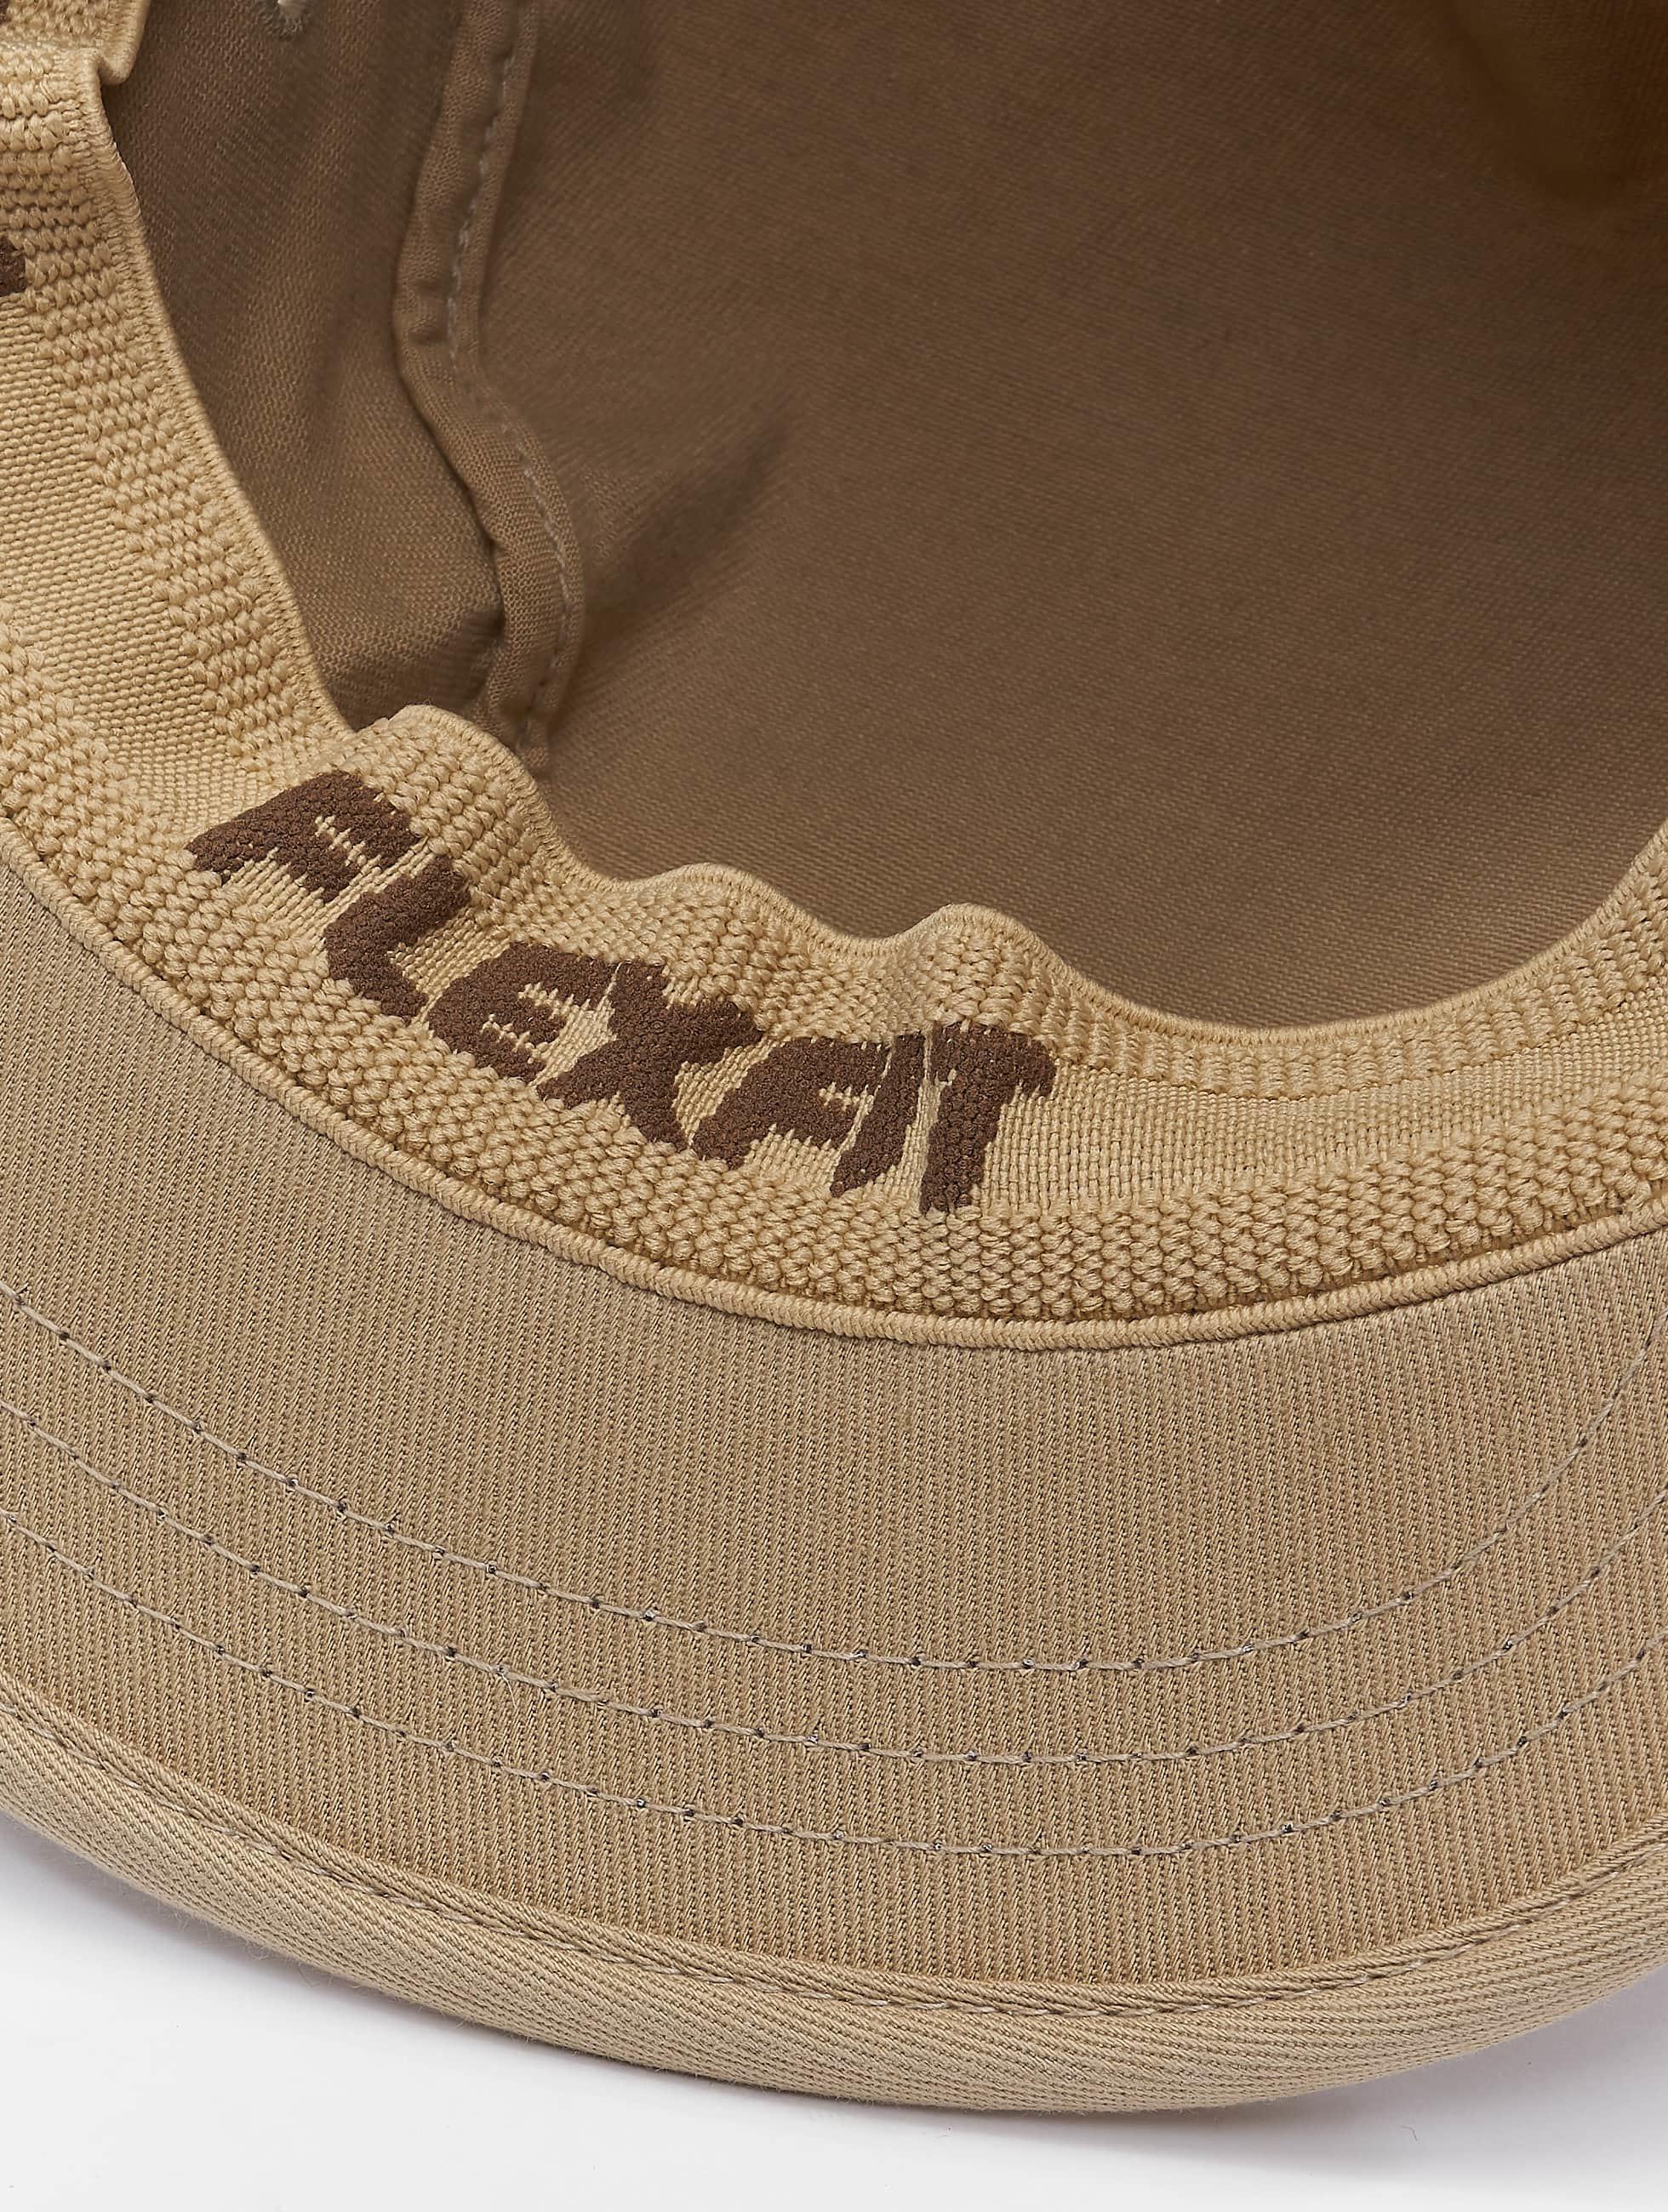 Flexfit Casquette Flex Fitted Top Gun Garmet Washed kaki